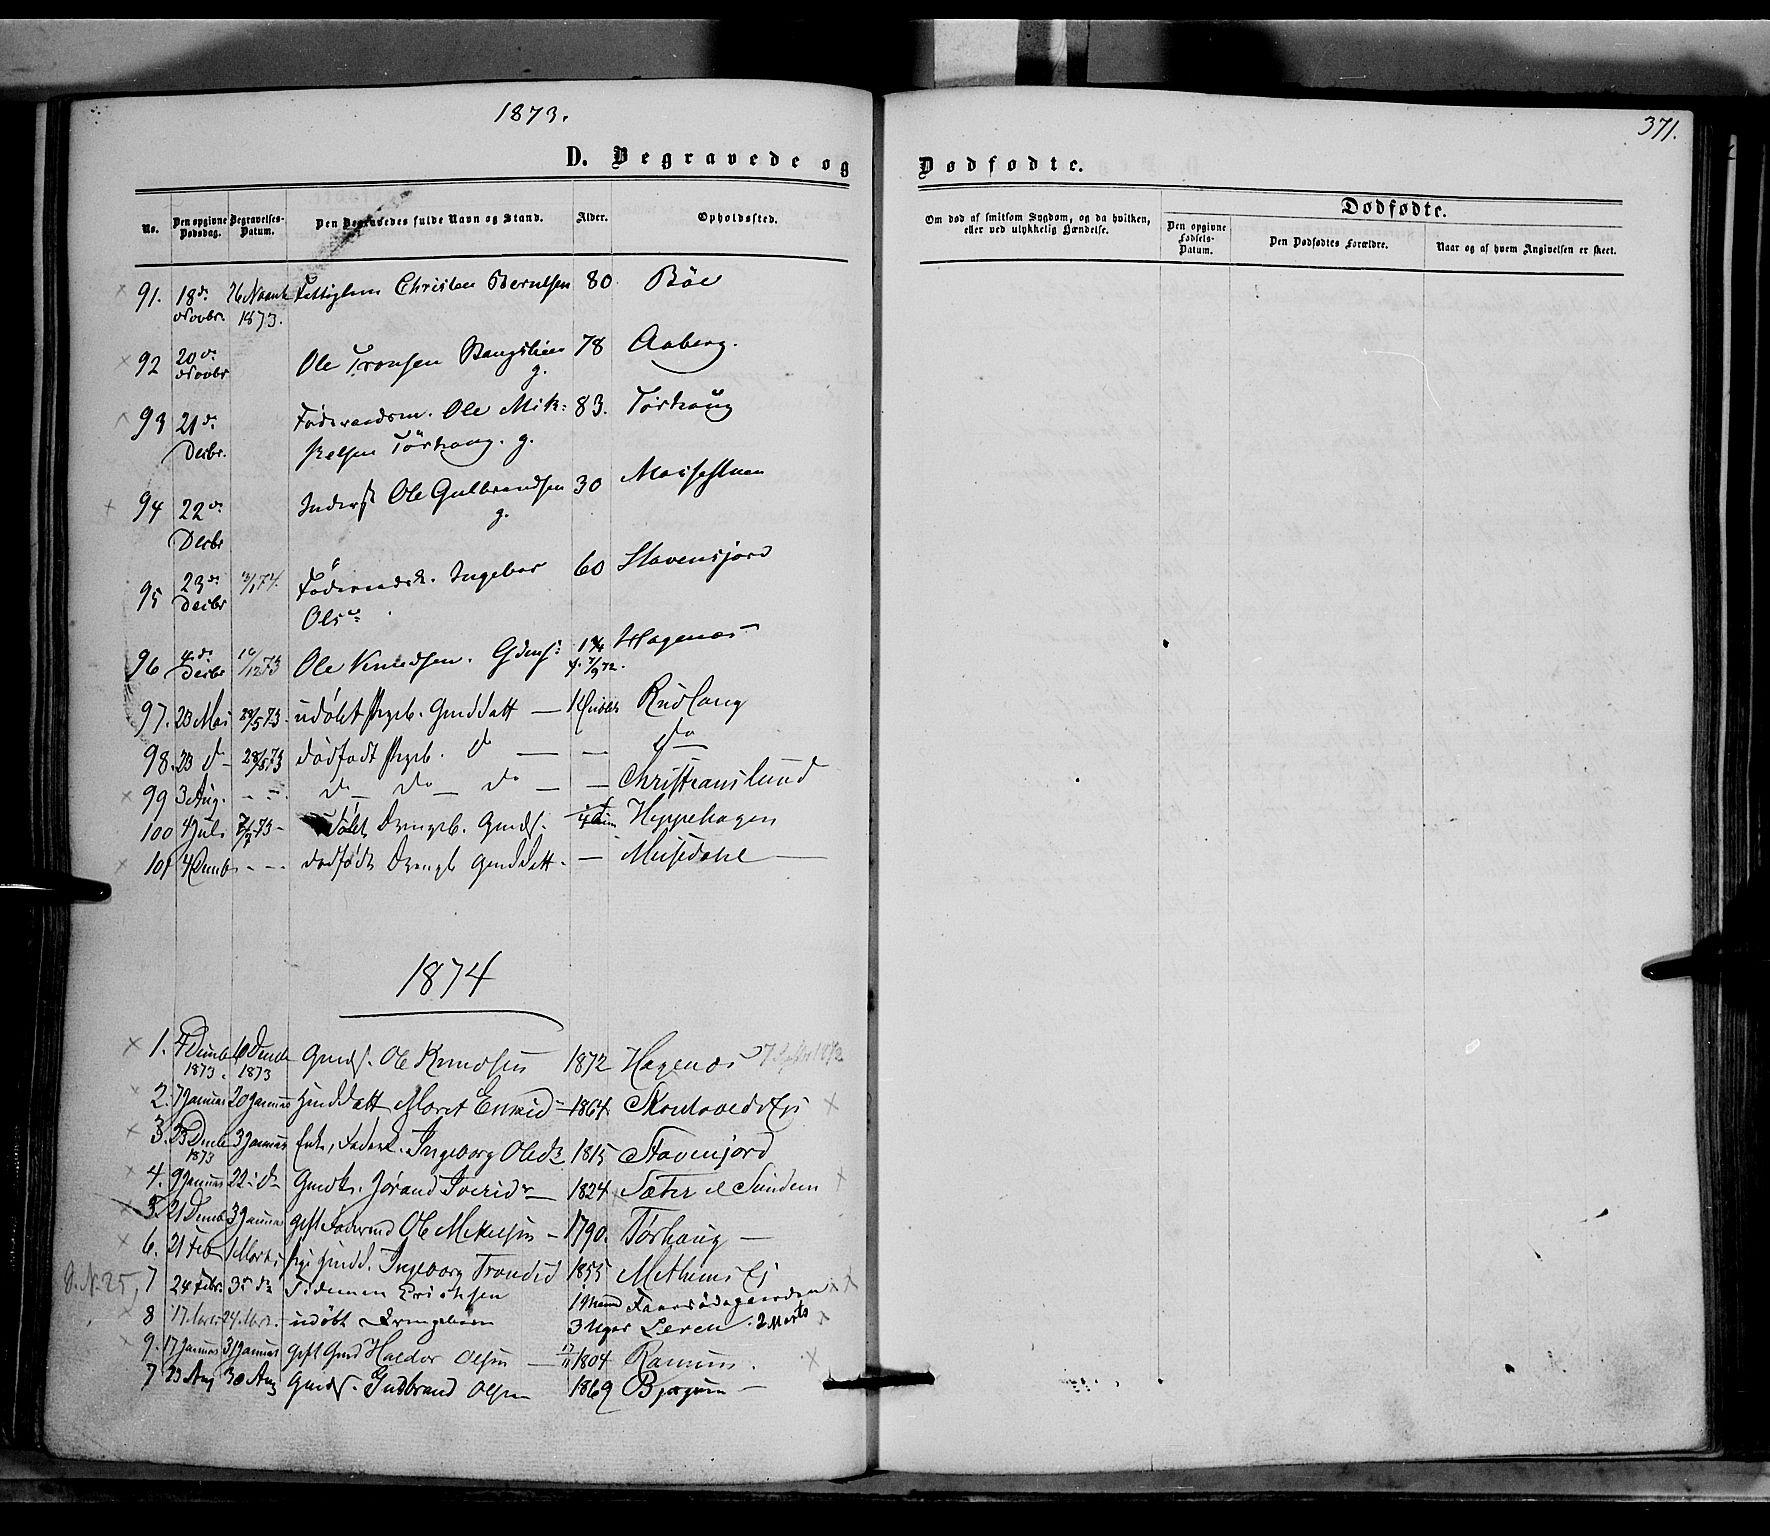 SAH, Nord-Aurdal prestekontor, Ministerialbok nr. 8, 1863-1875, s. 371